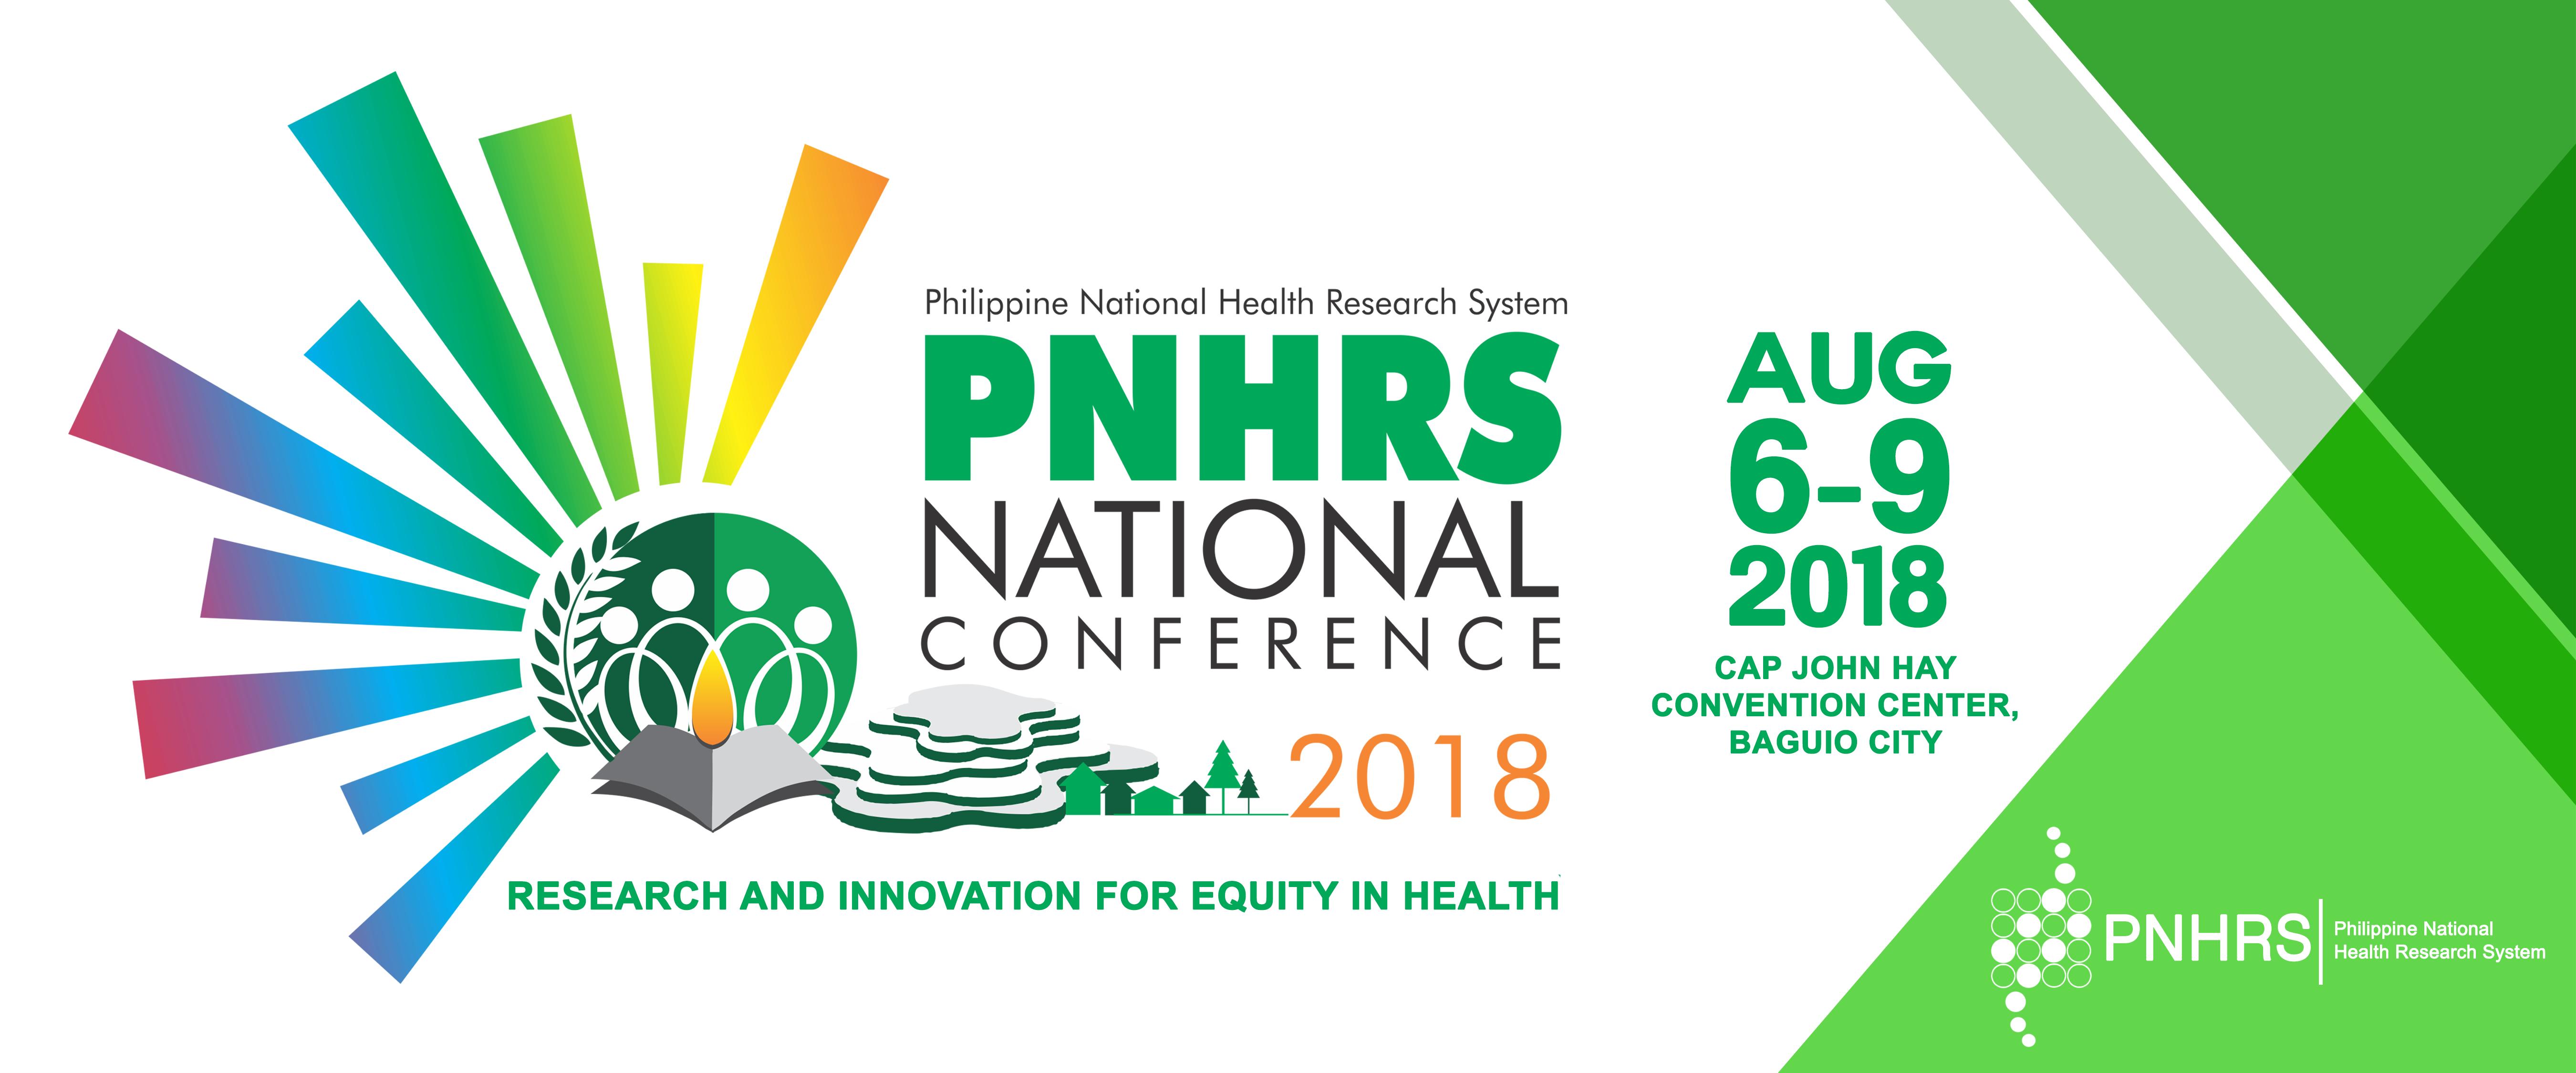 PNHRS Week Celebration 2018